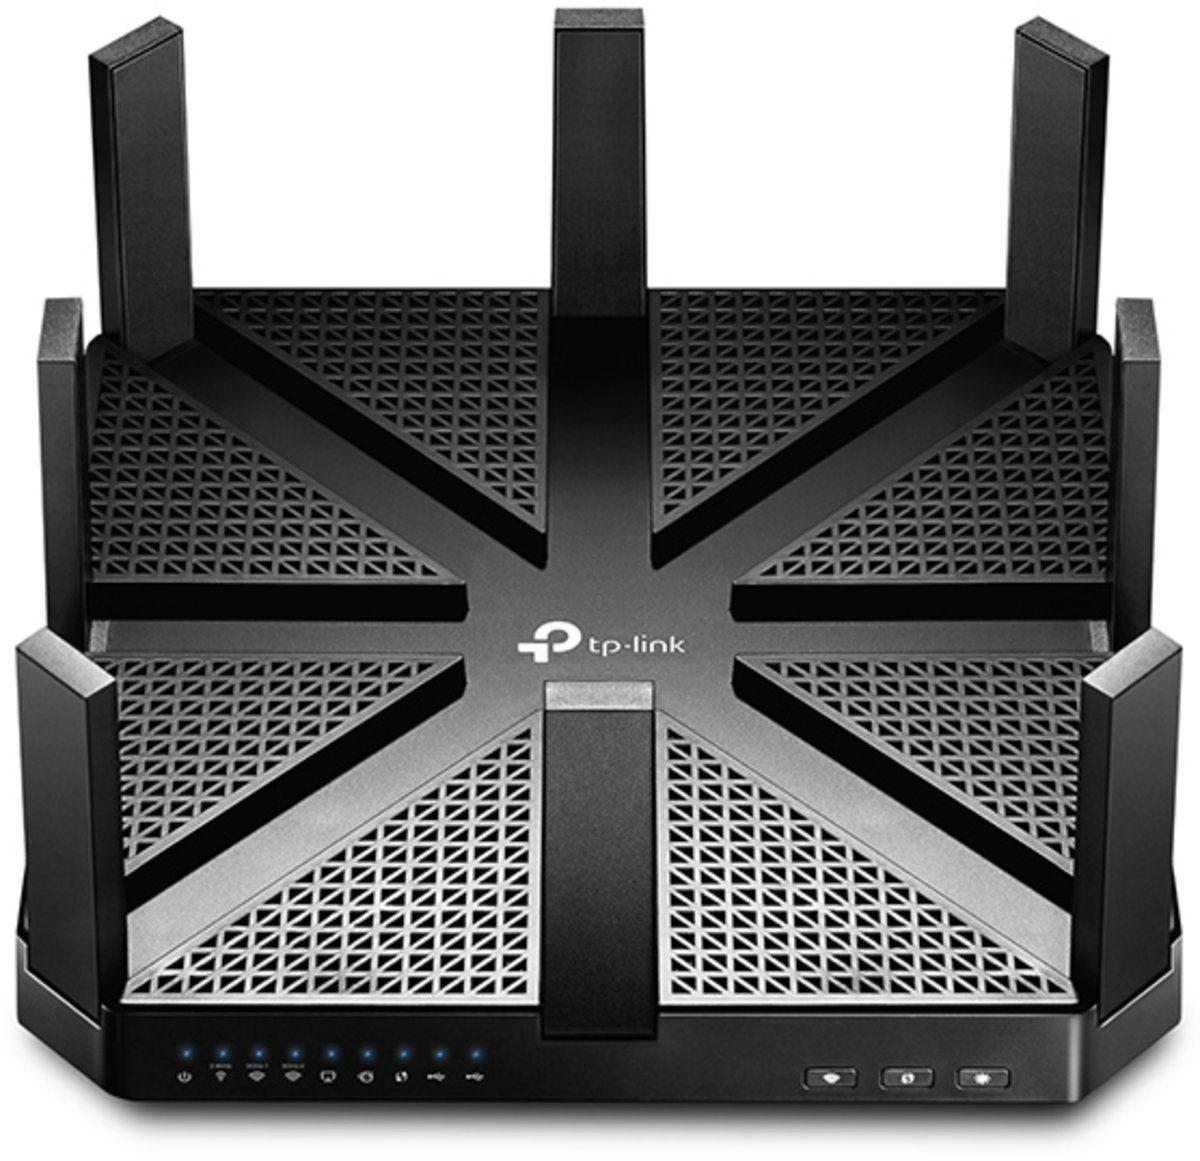 TP-Link Router »Archer C5400 WLAN Tri-Band Gigabit«